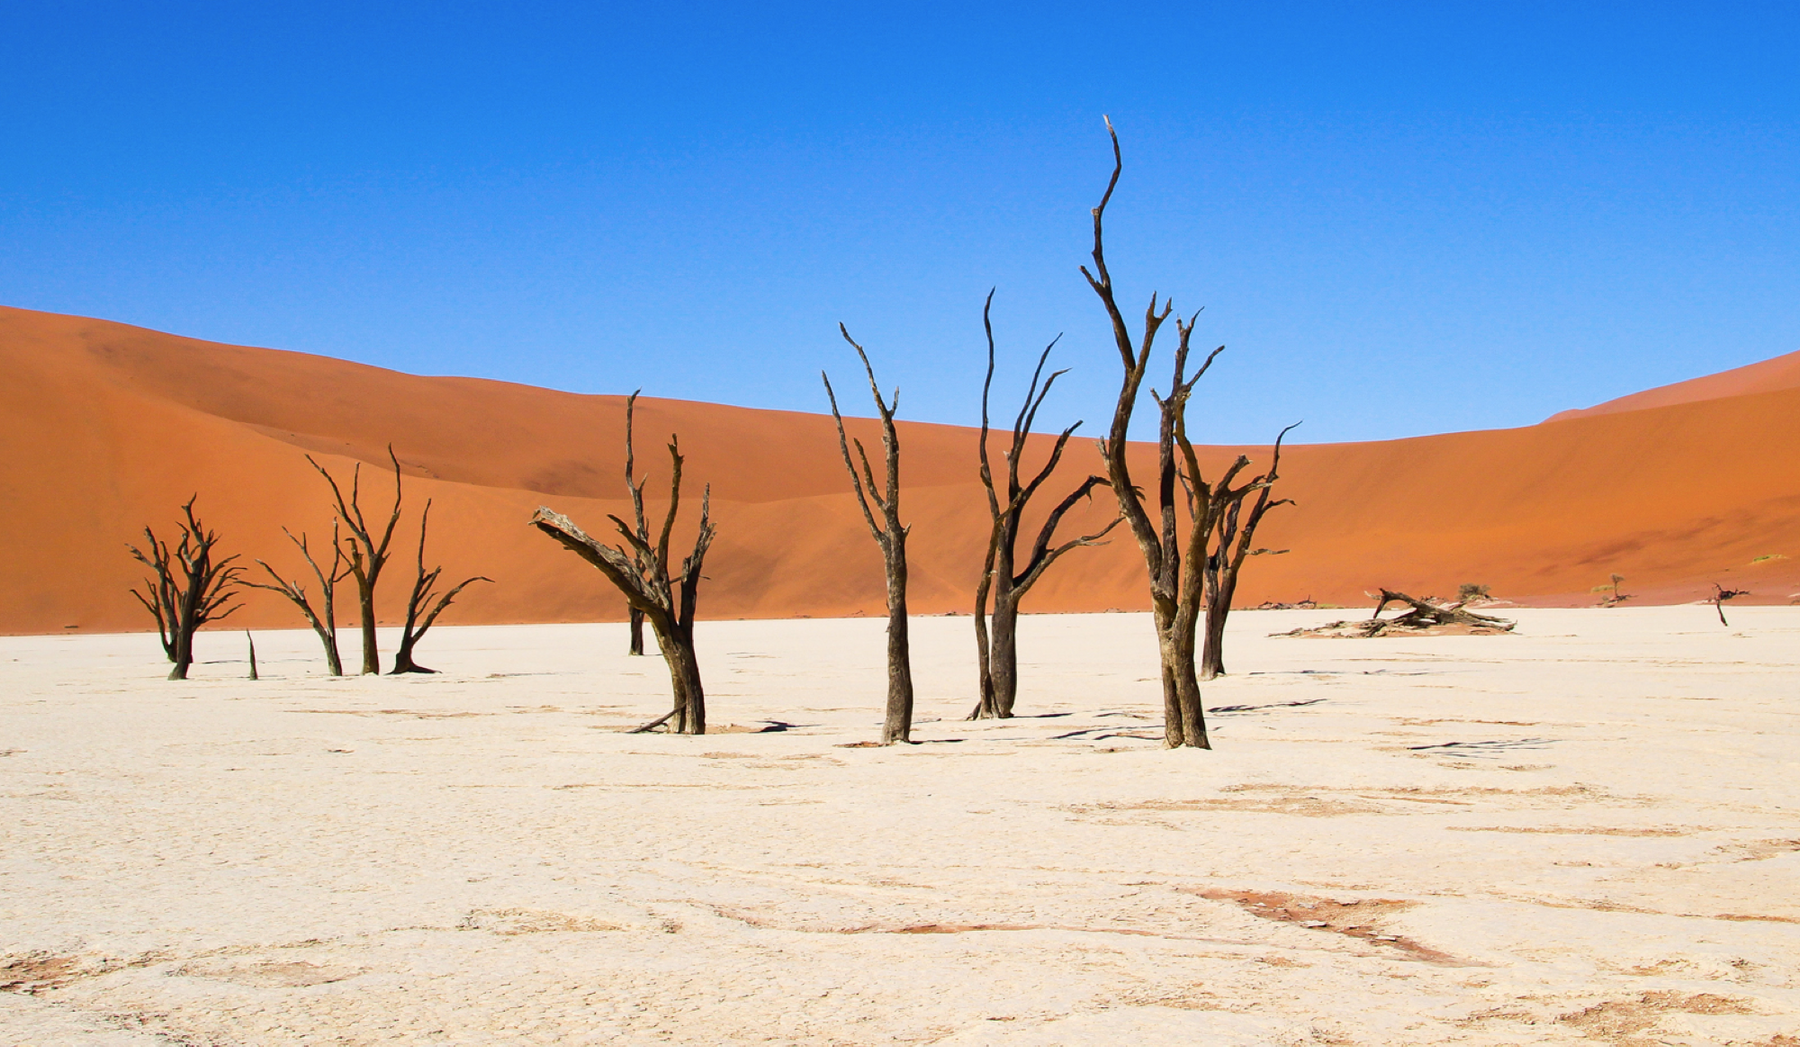 Deserto da Namíbia, um dos países abertos para turistas brasileiros.